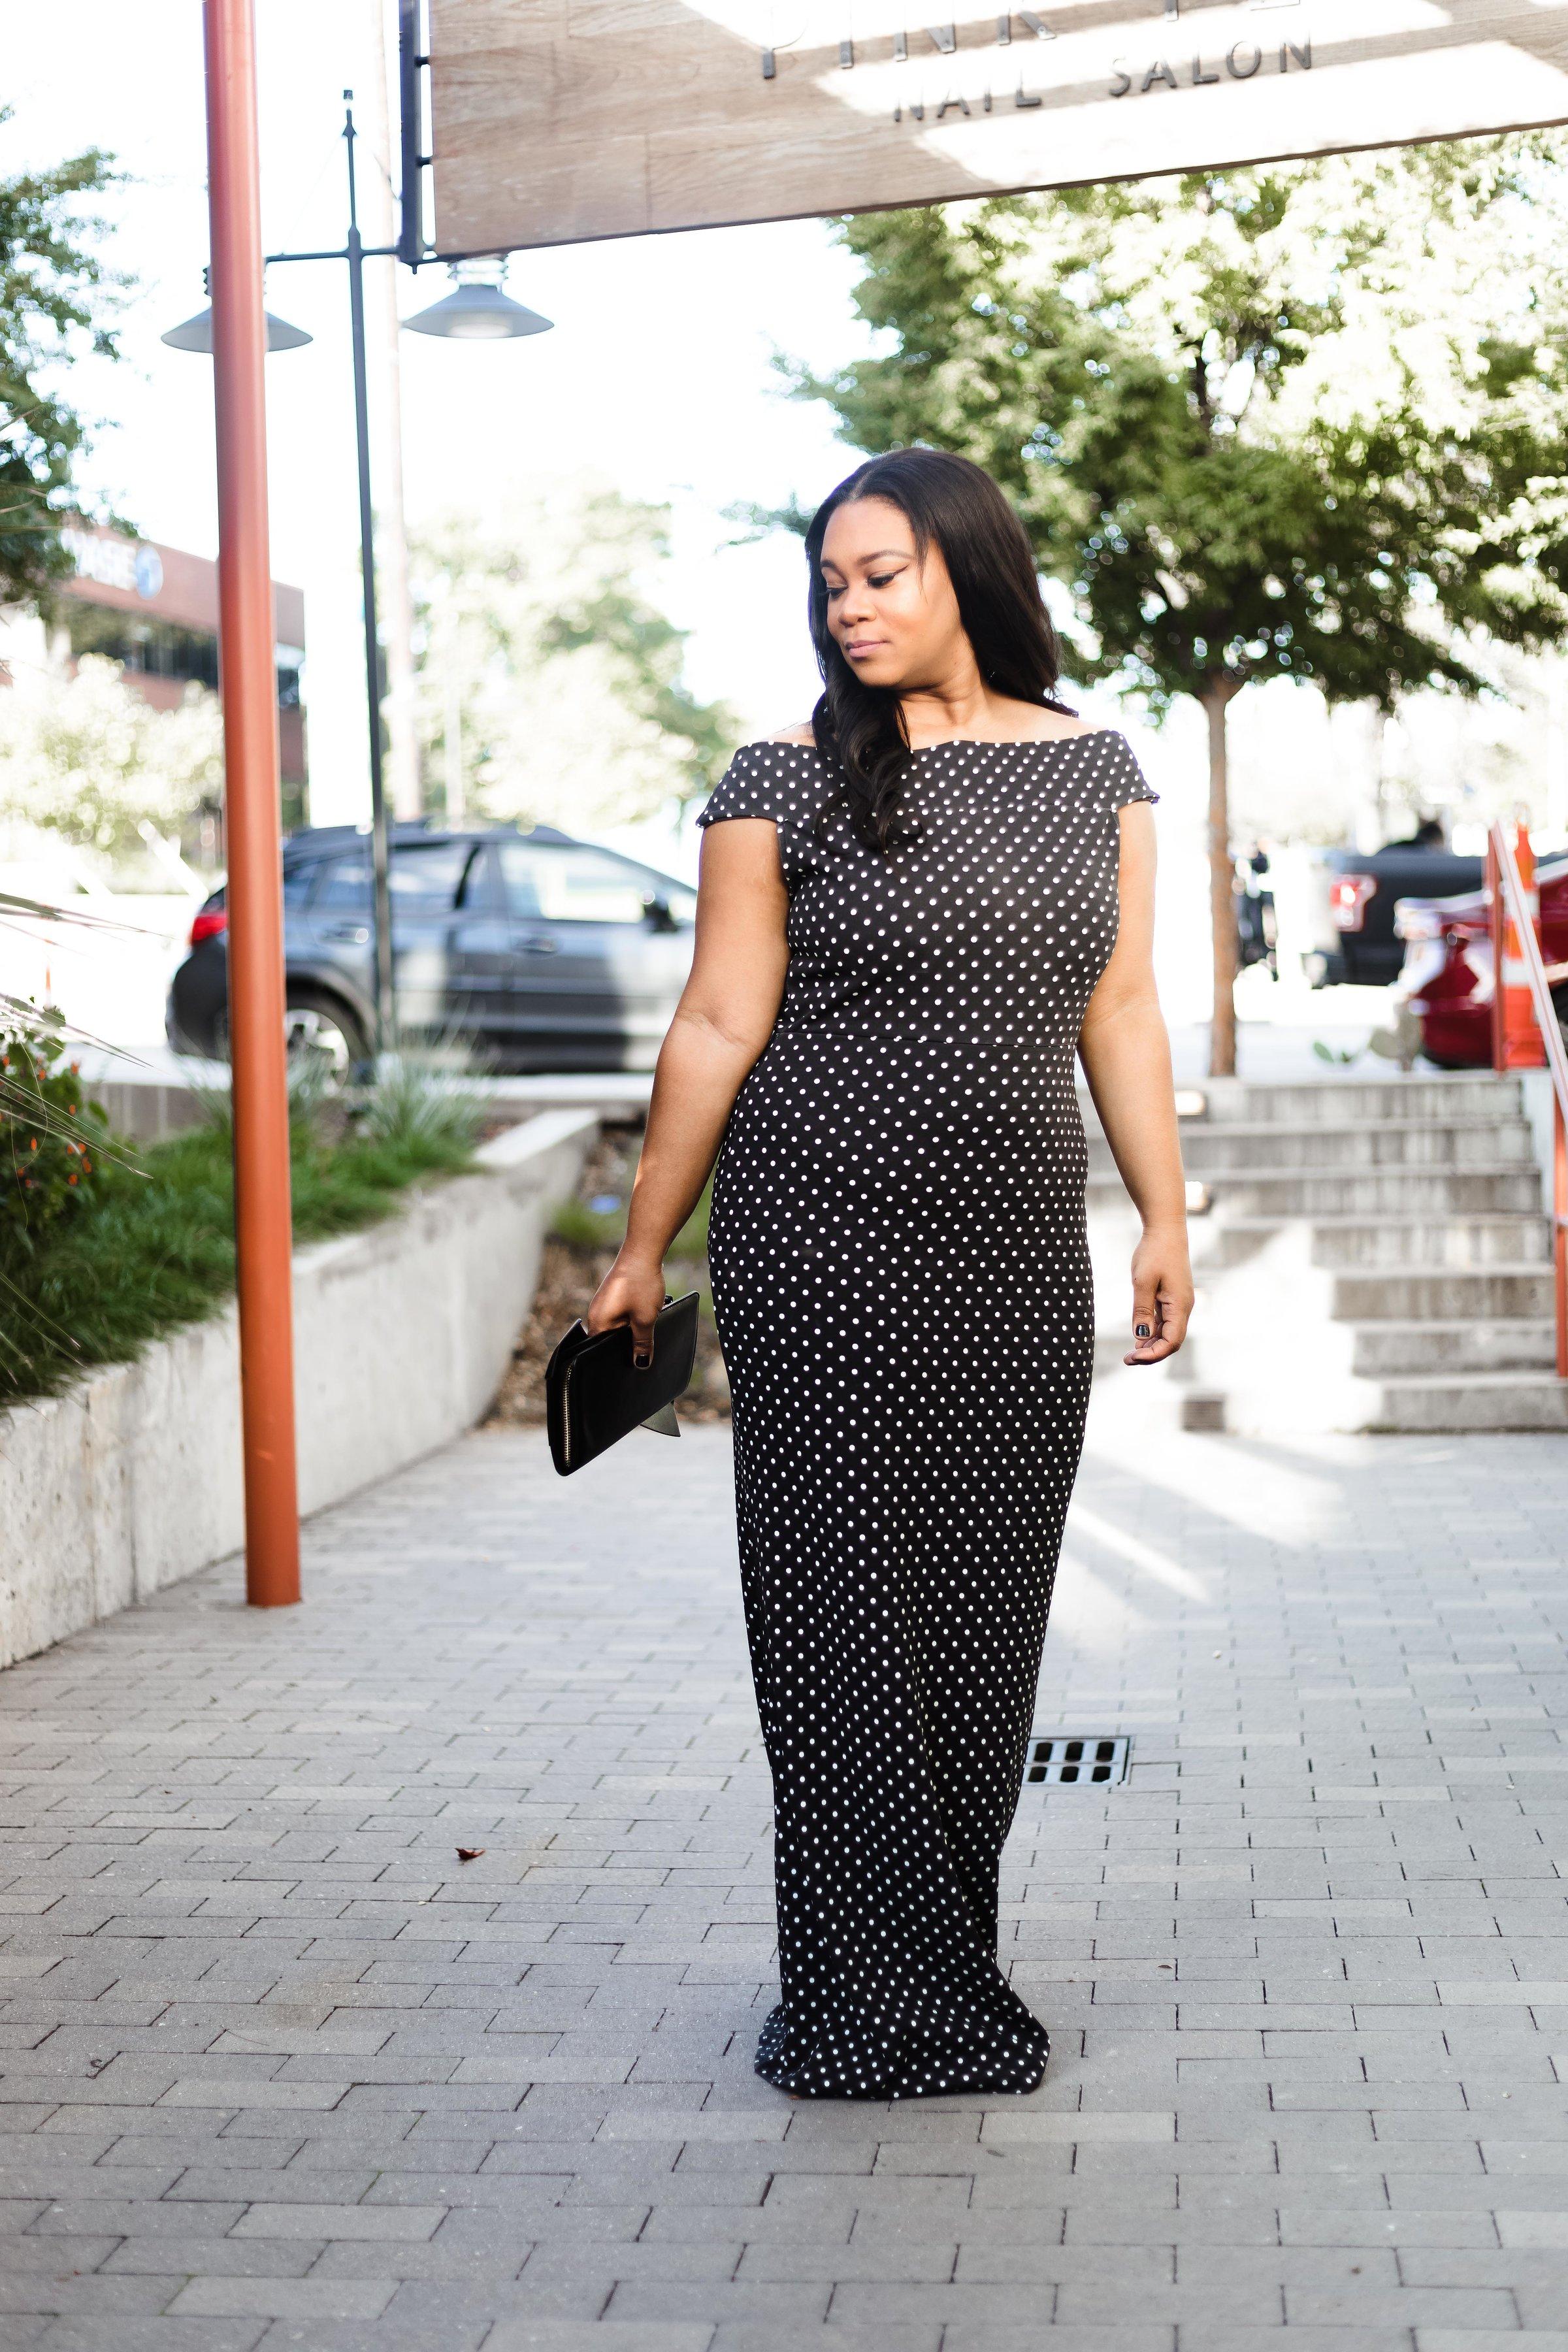 Polka Dot Maxi Dress - Natalie Greagor (6).jpg